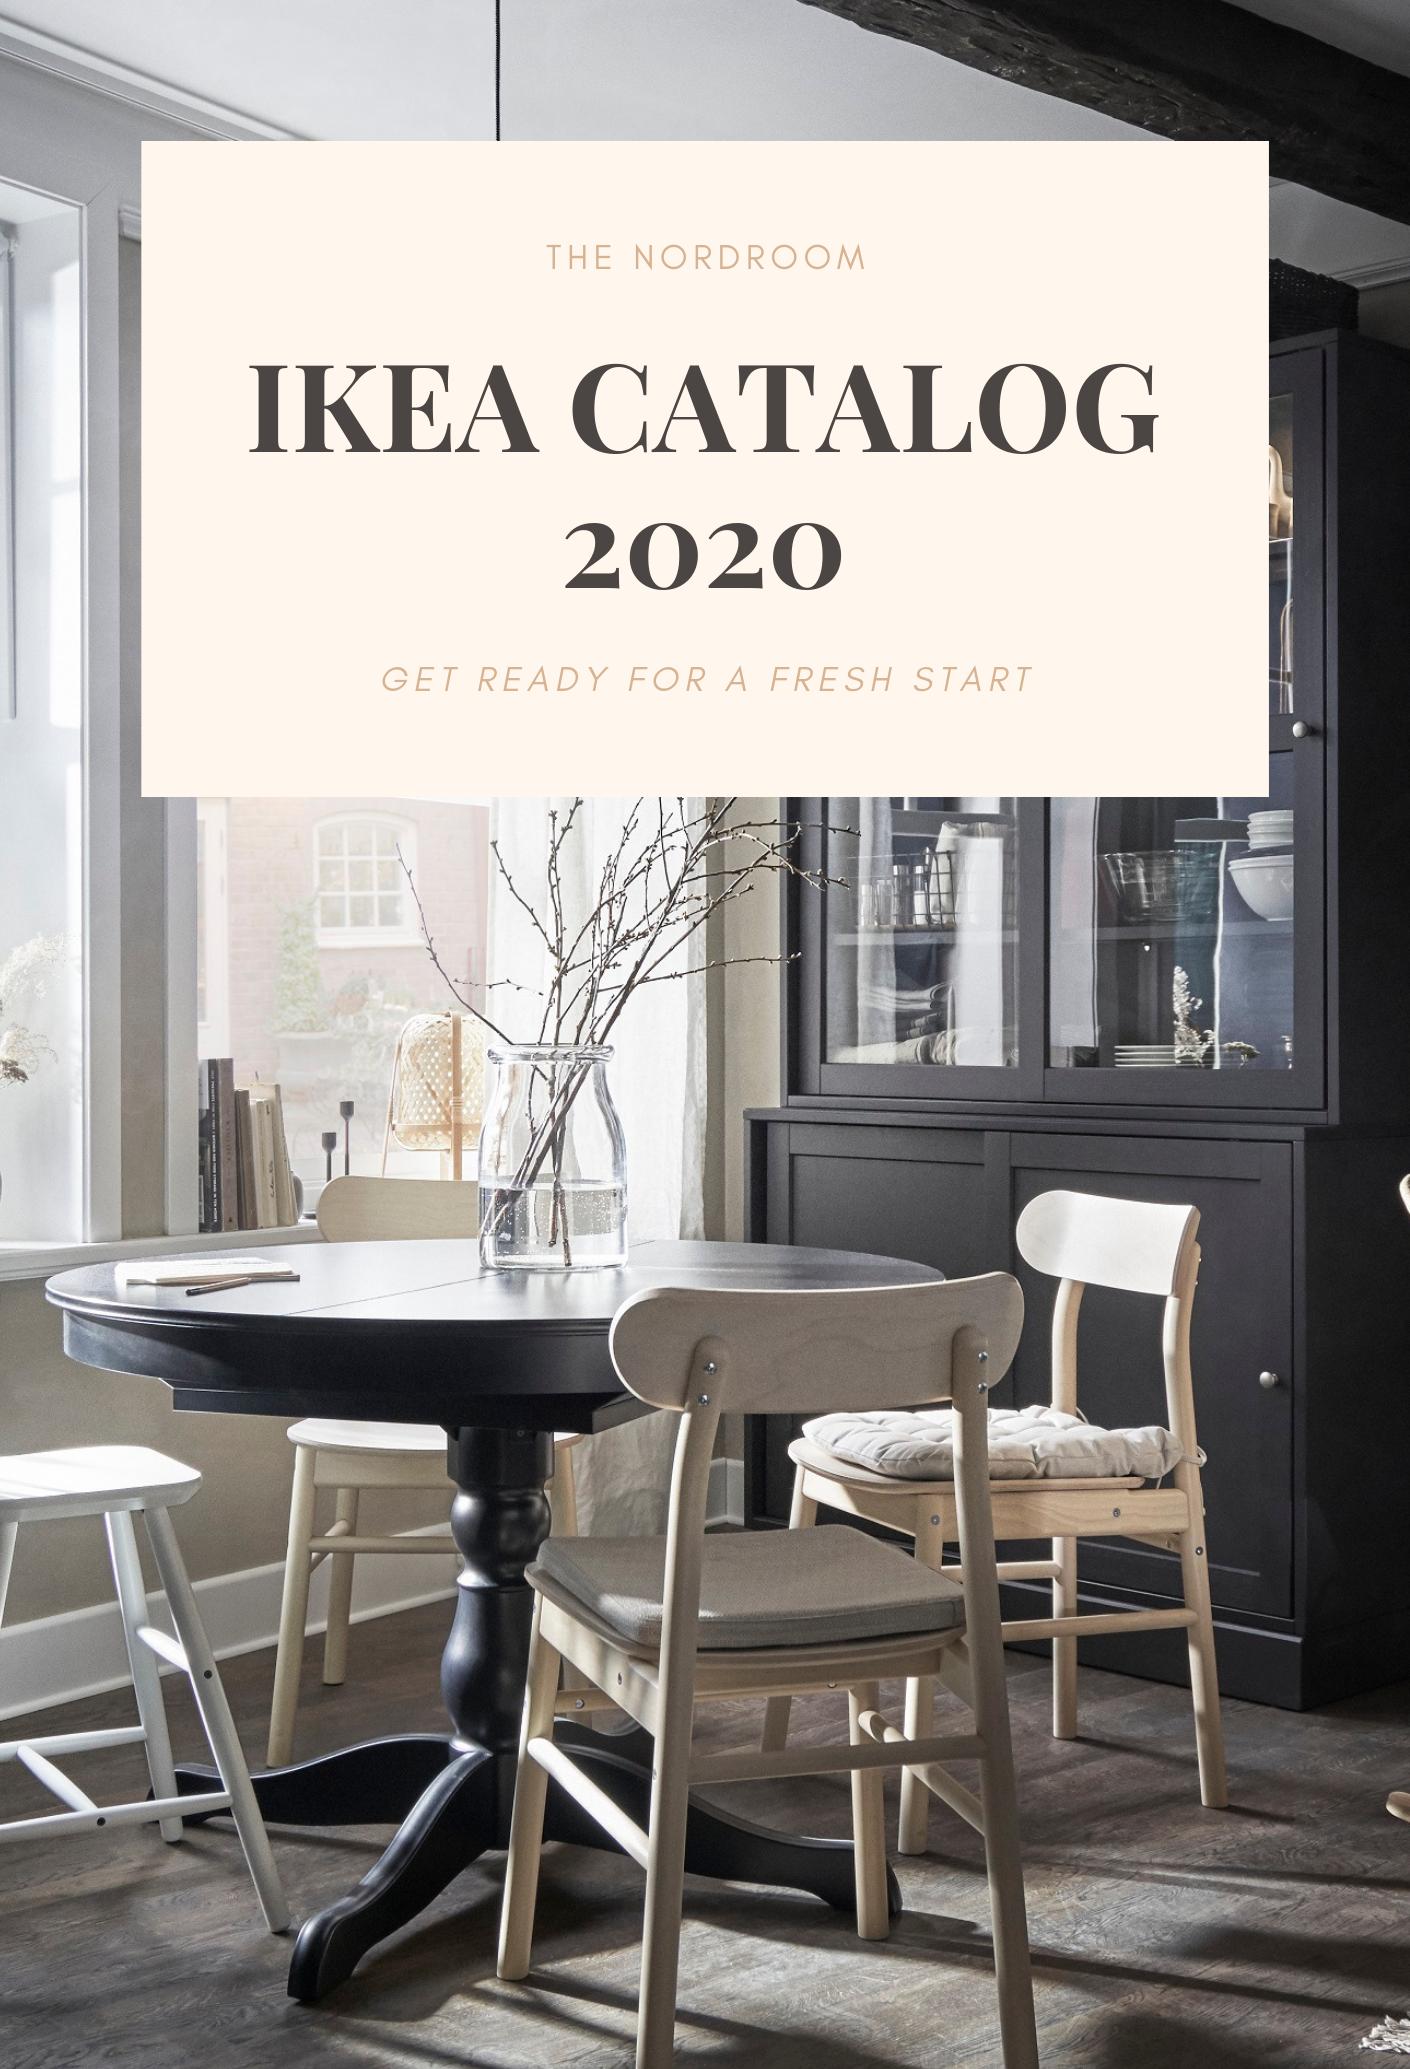 22+ Ikea kitchen design ideas 2020 info